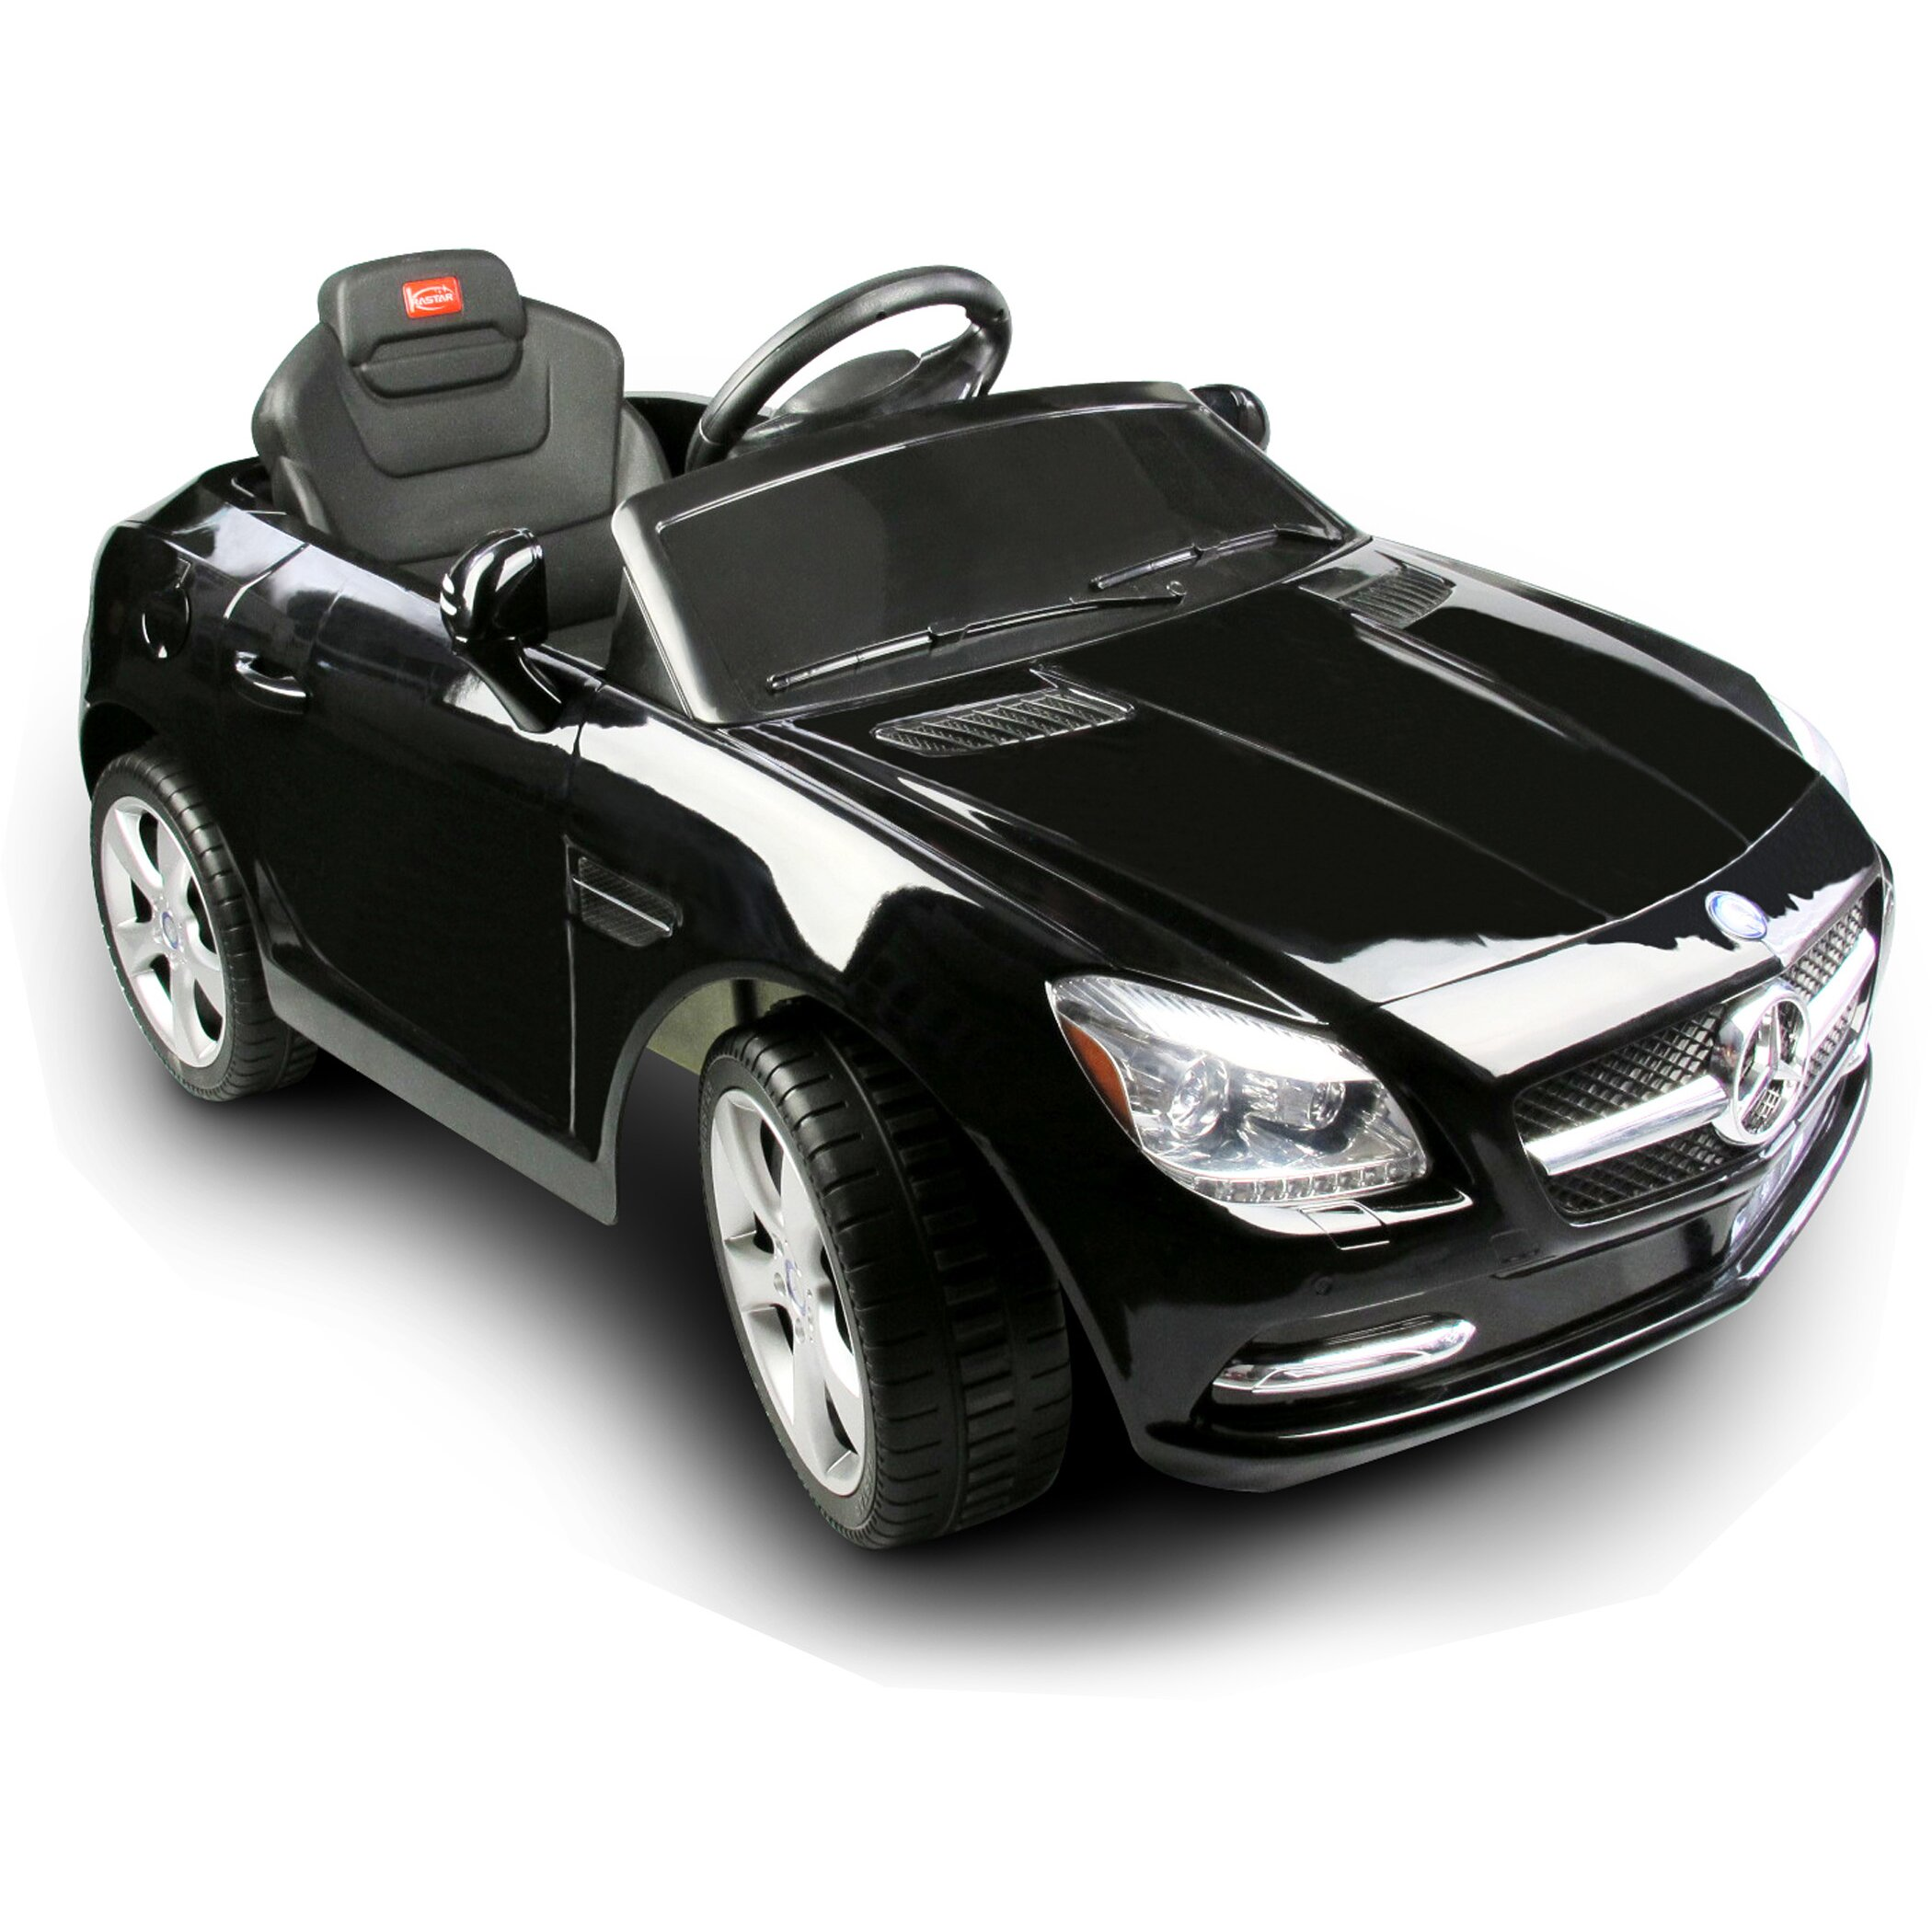 Storm Two Seater Car Vroom Rider Mercedes Benz Slk Rastar V Battery